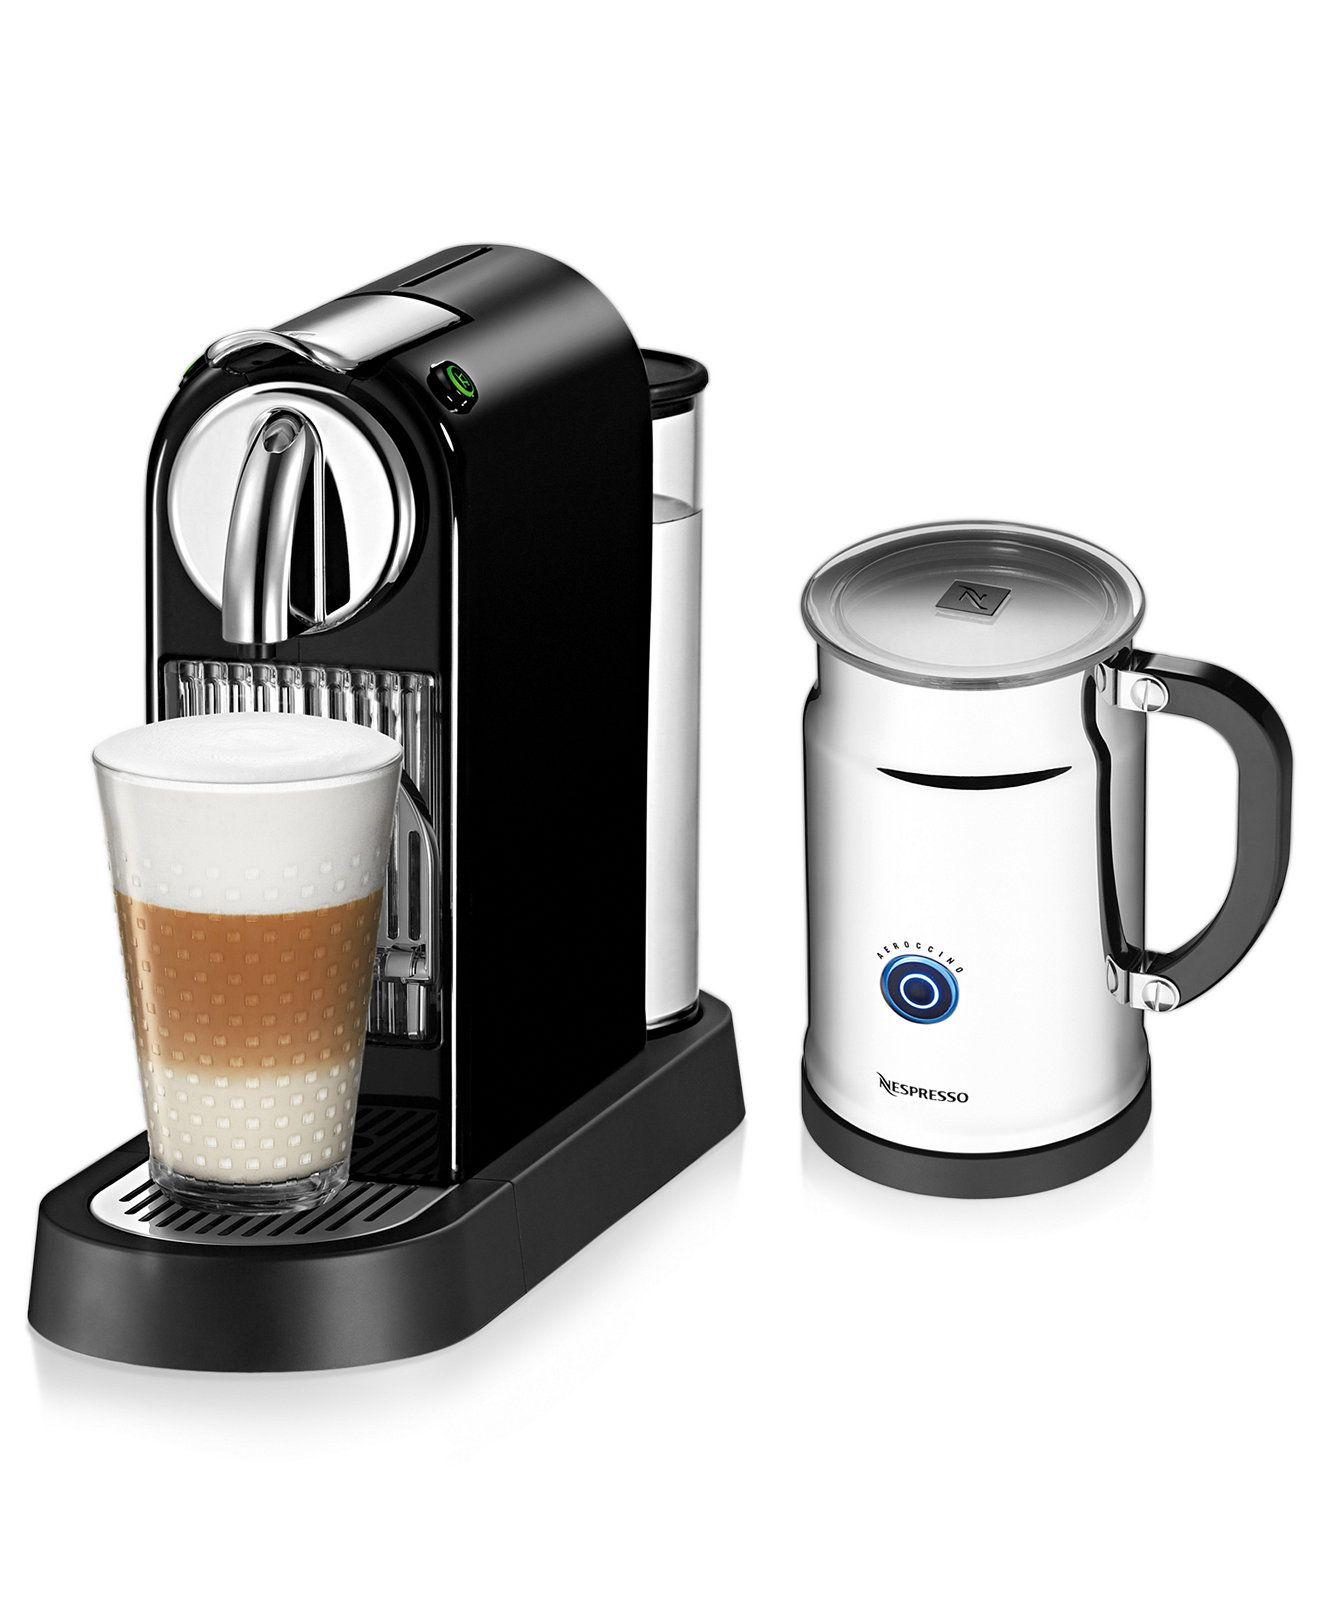 Nespresso C111/D111 Espresso Maker, Citiz Bundle Coffee